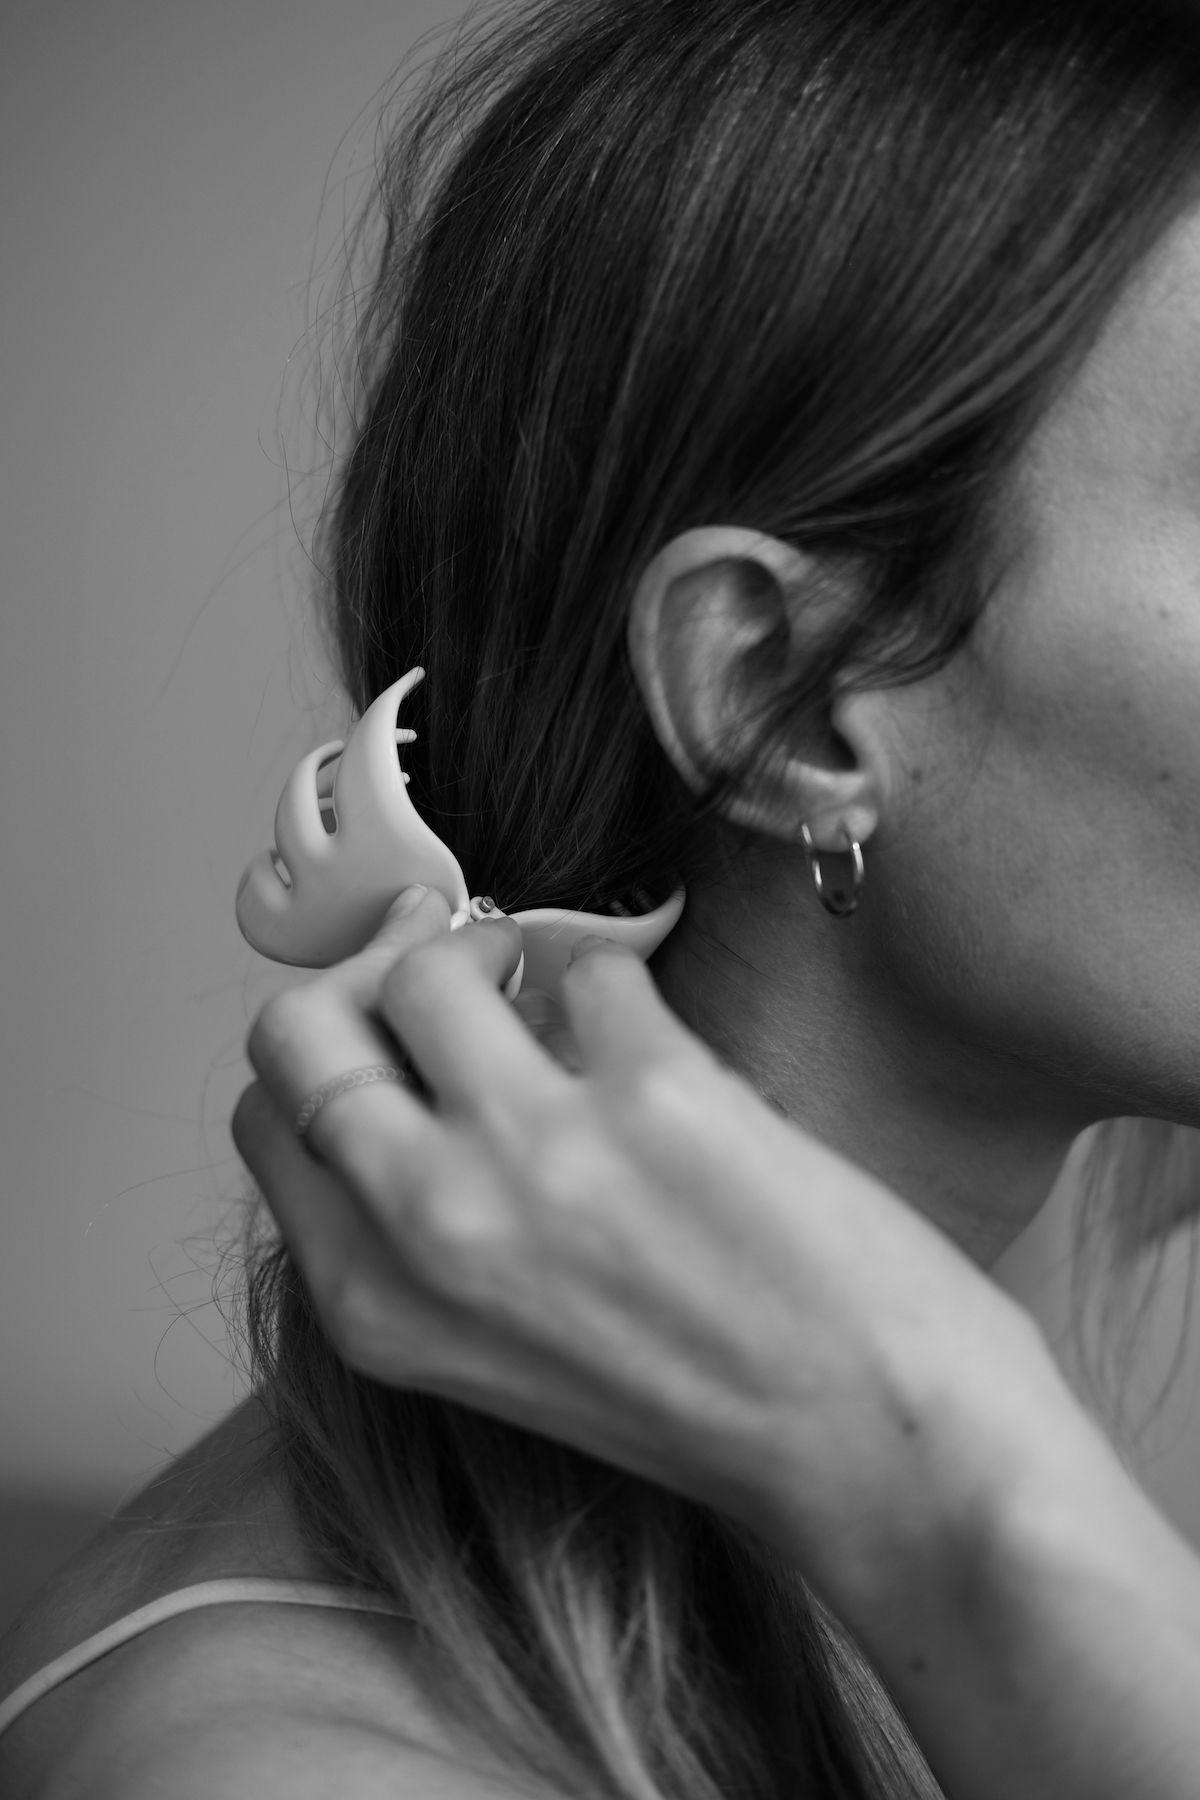 Beautyblog Elina Neumann Blackheads Mitesser